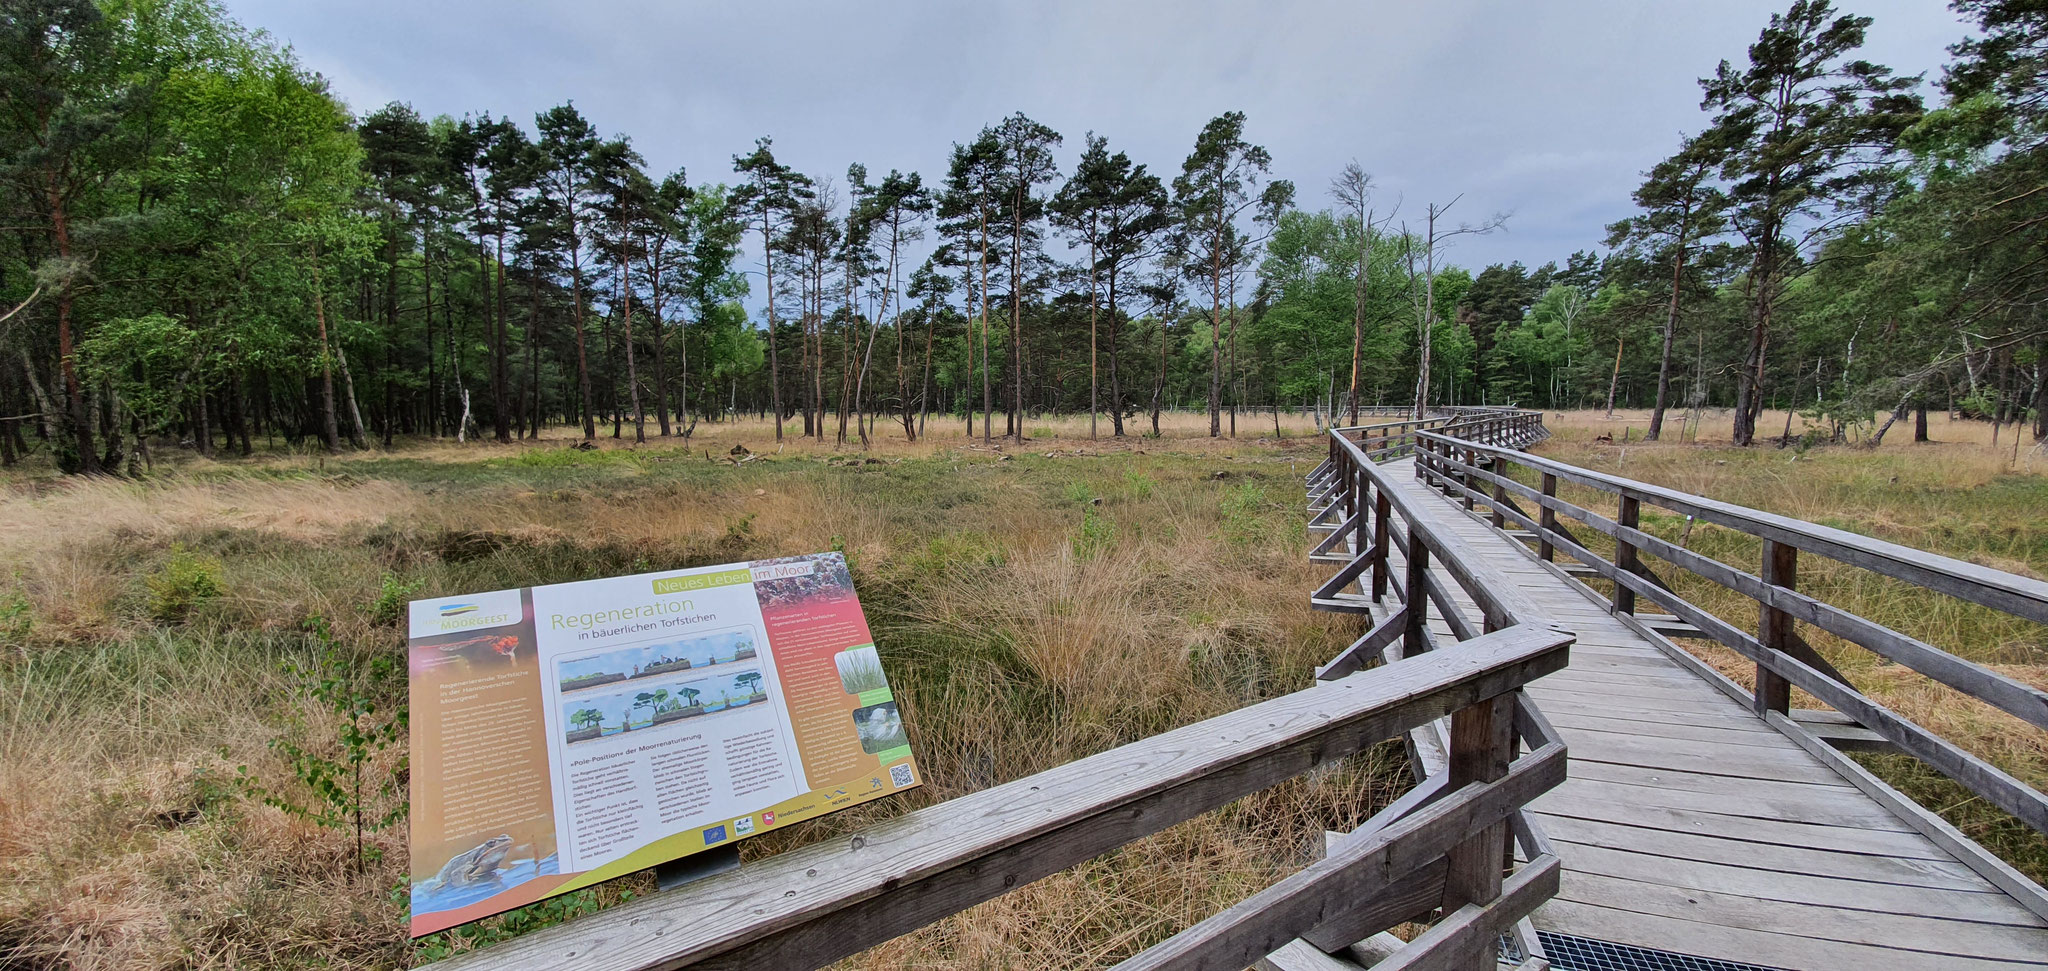 Infotafel auf dem Moor-Erlebnispfad,Foto:NABU/L.Reinberger